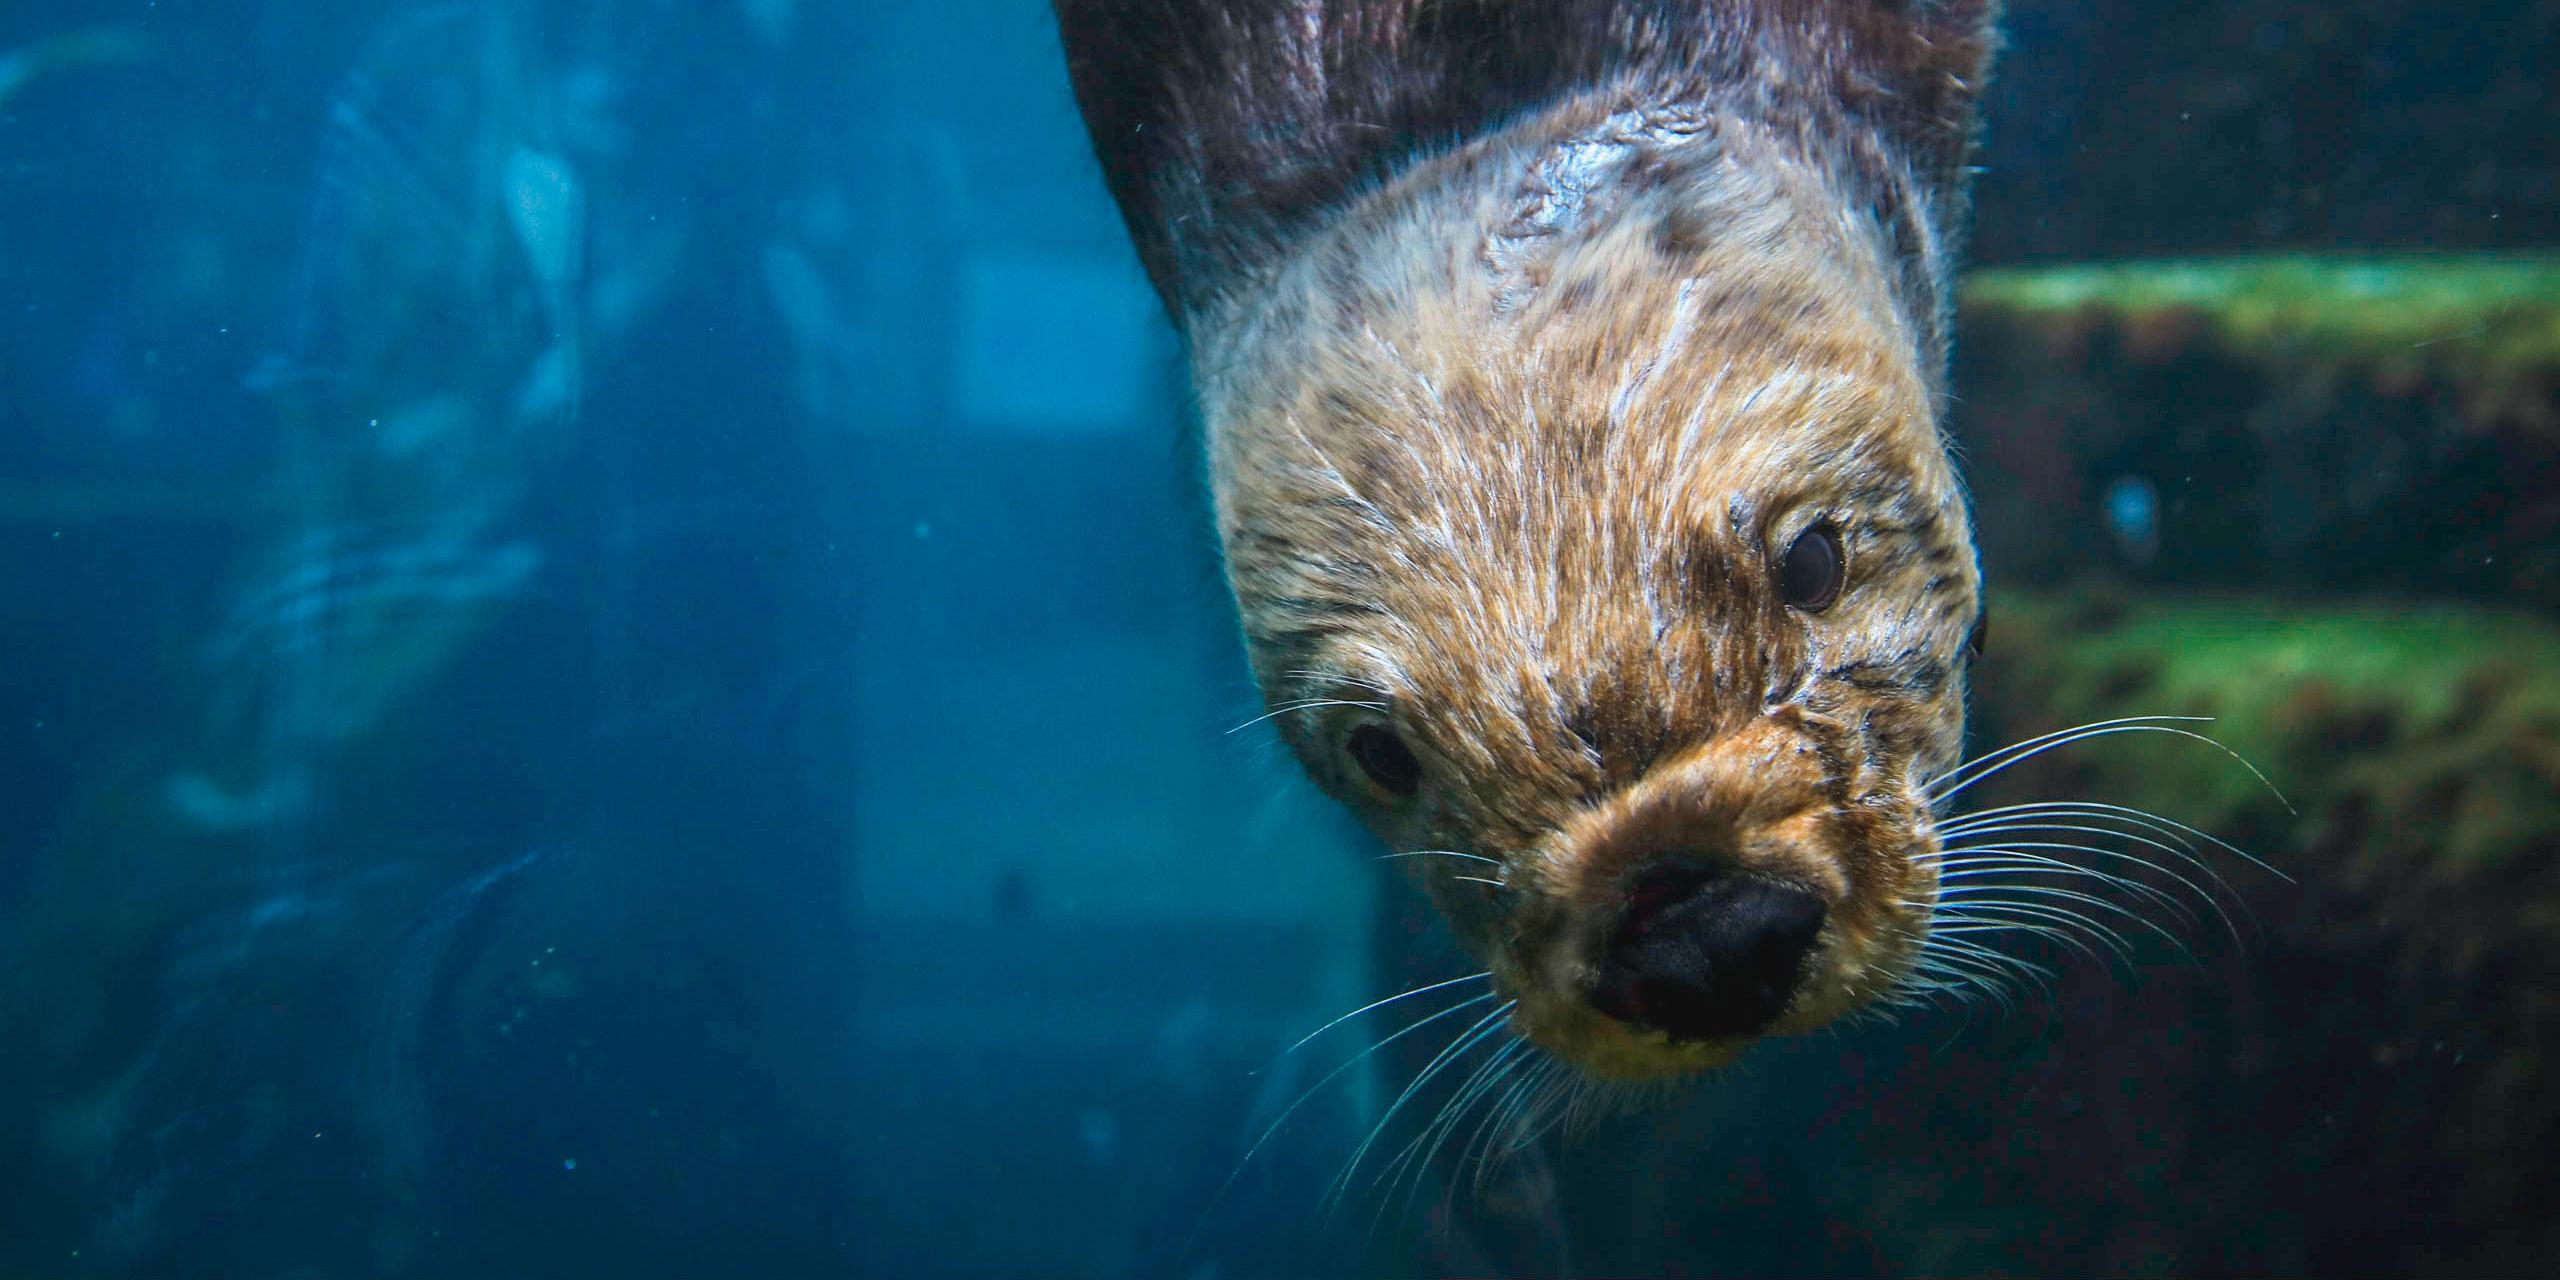 Monterey Bay Aquarium; Courtesy of Knmata/Shutterstock